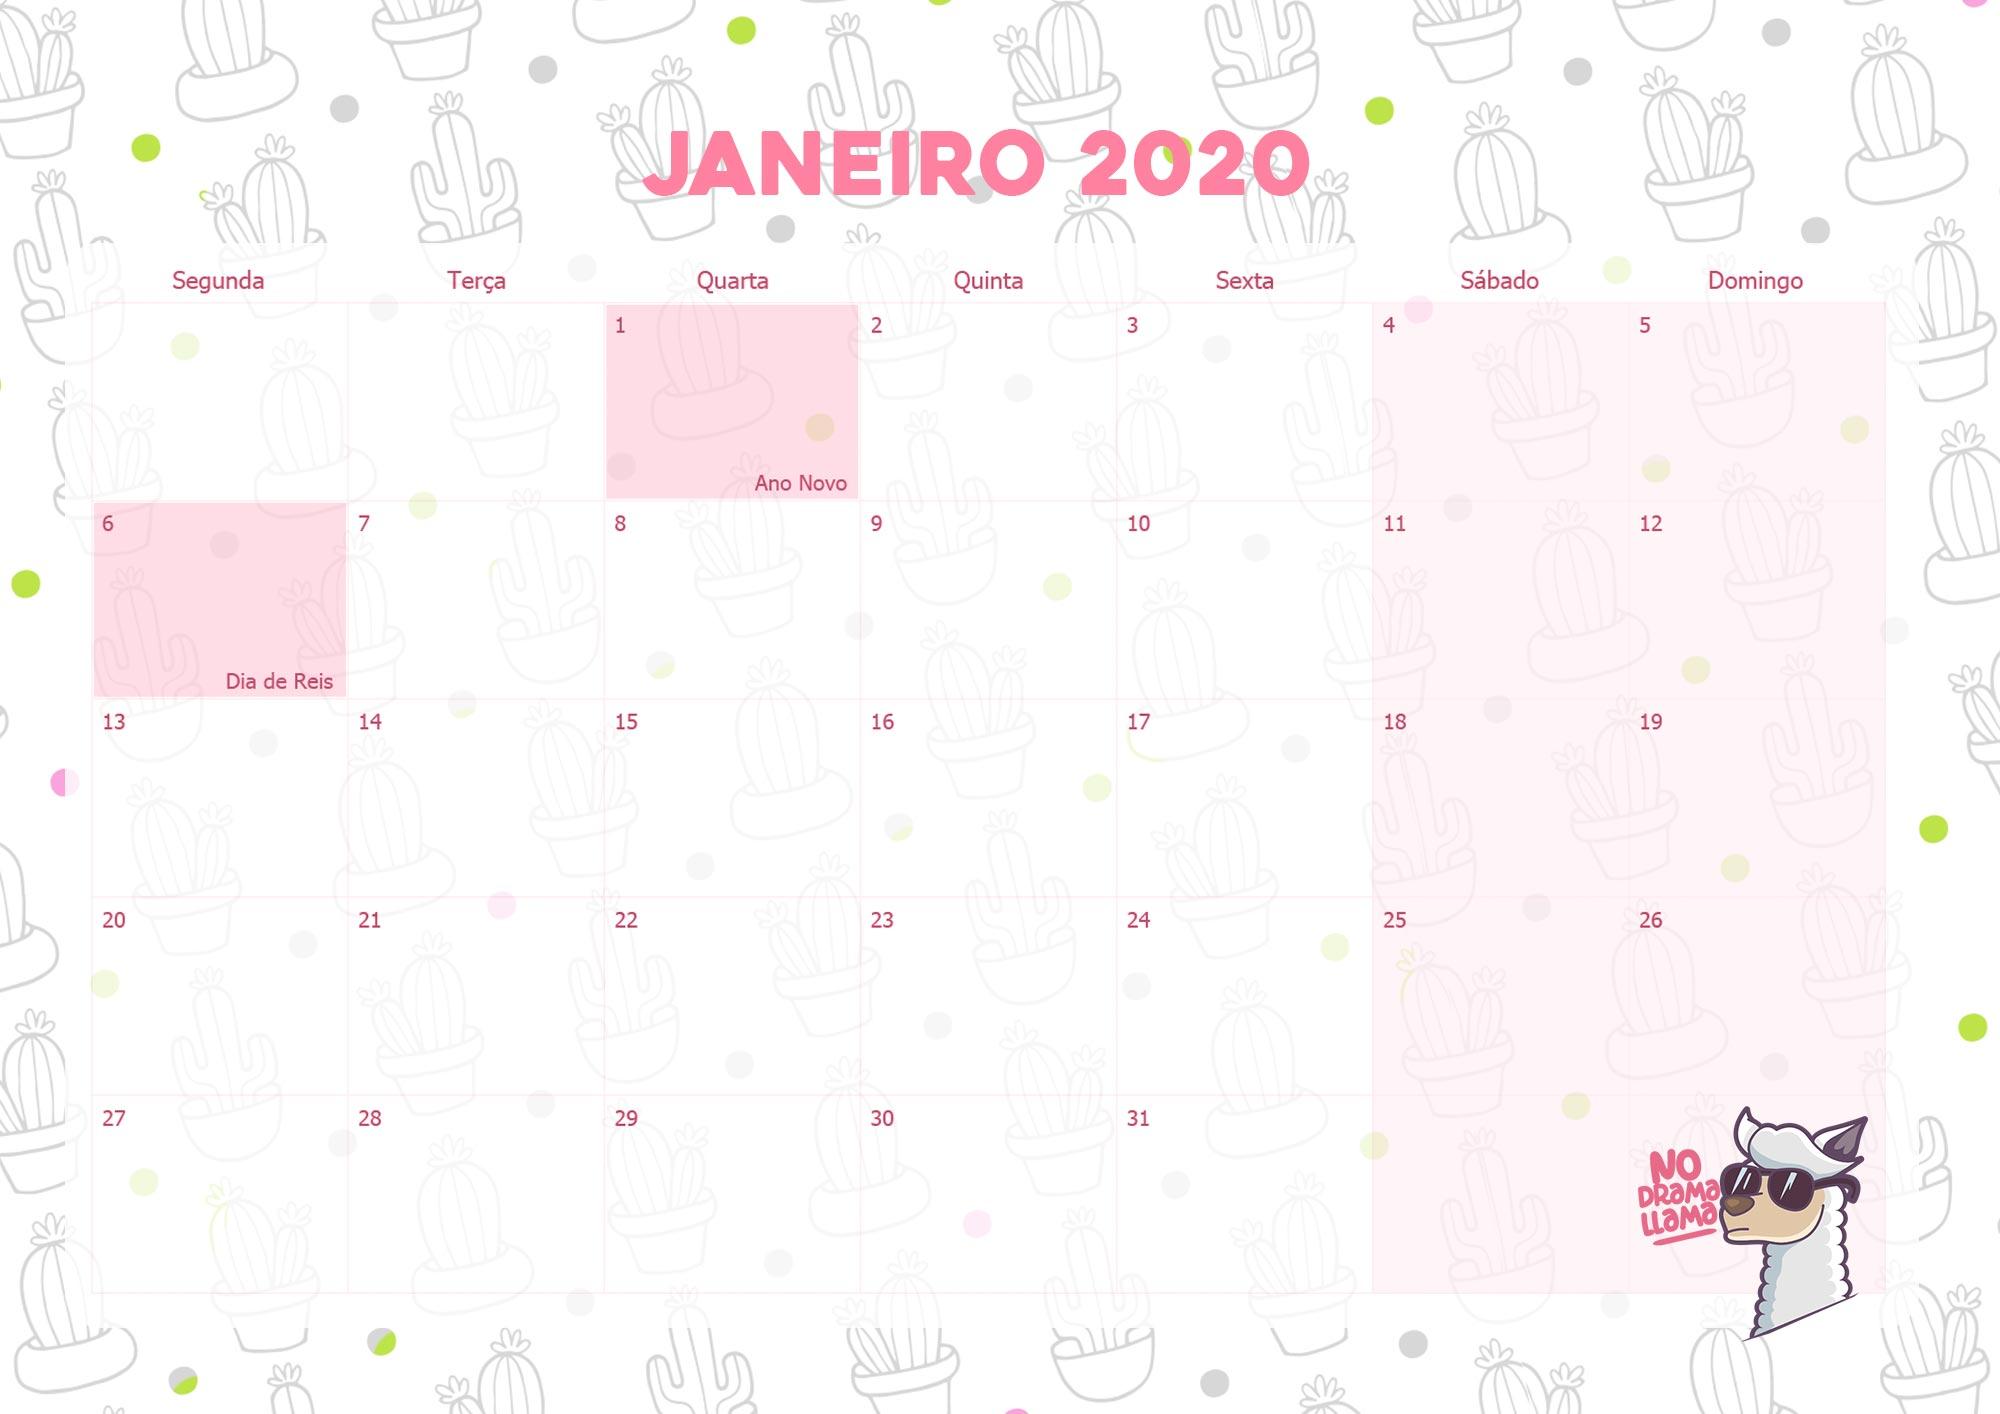 Calendario Mensal Lhama Drama 2020 Janeiro